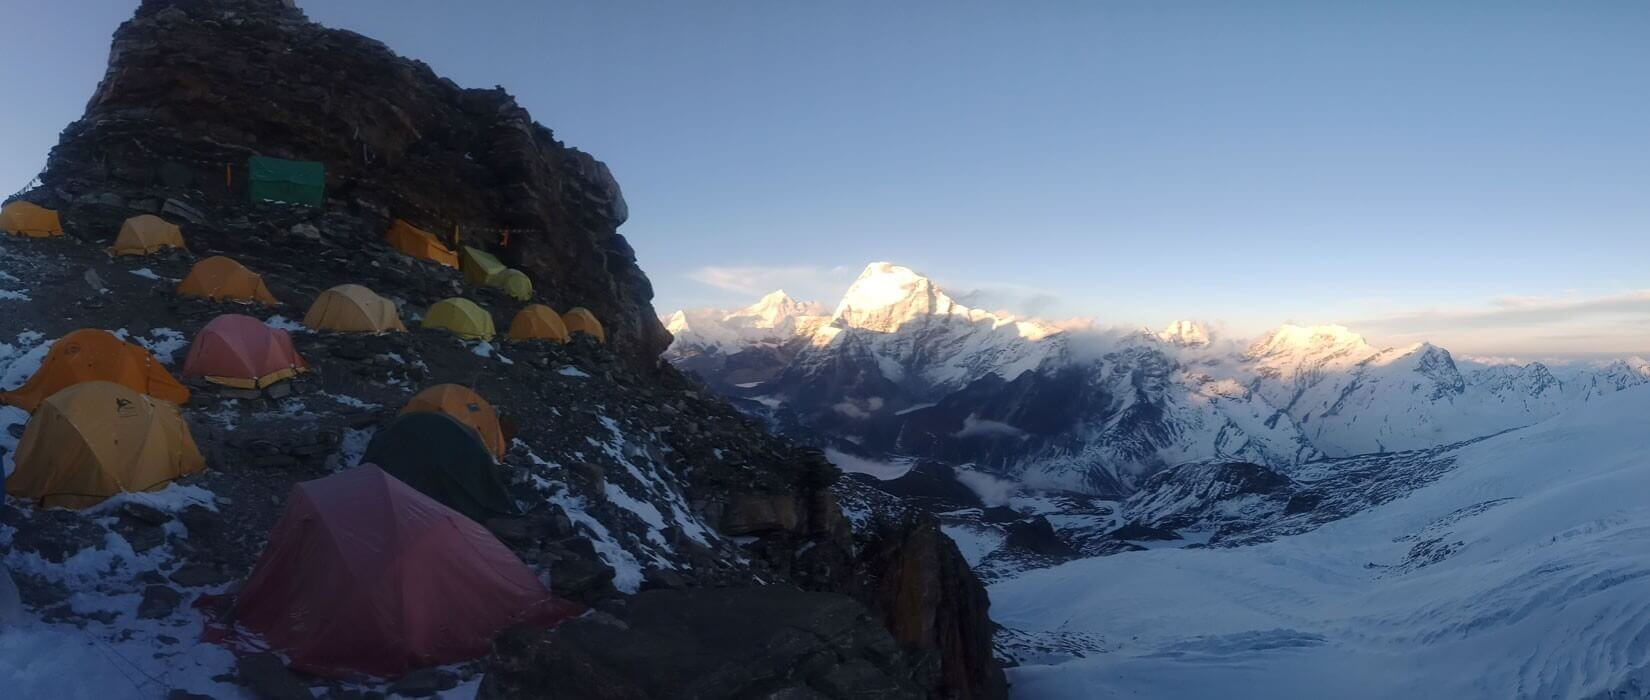 Mera Peak High Camp View